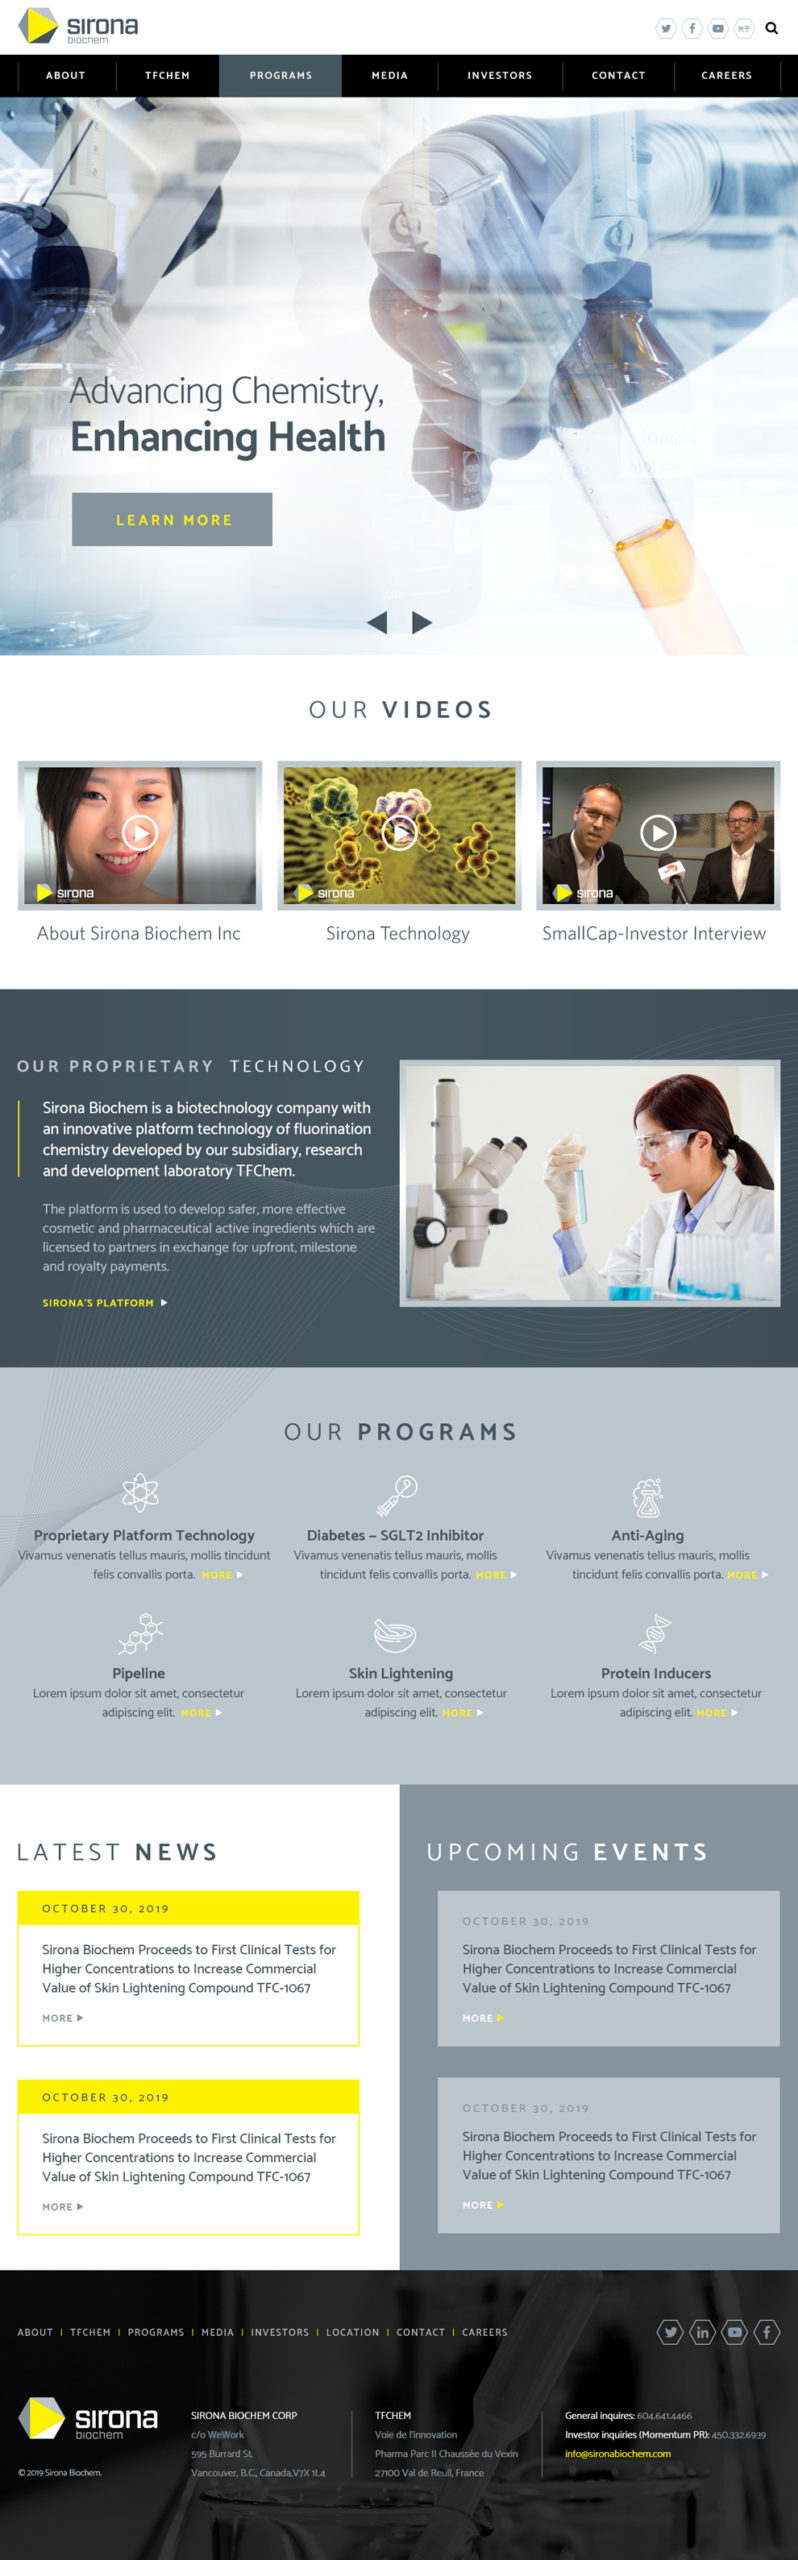 Sirona Biochem Website Design